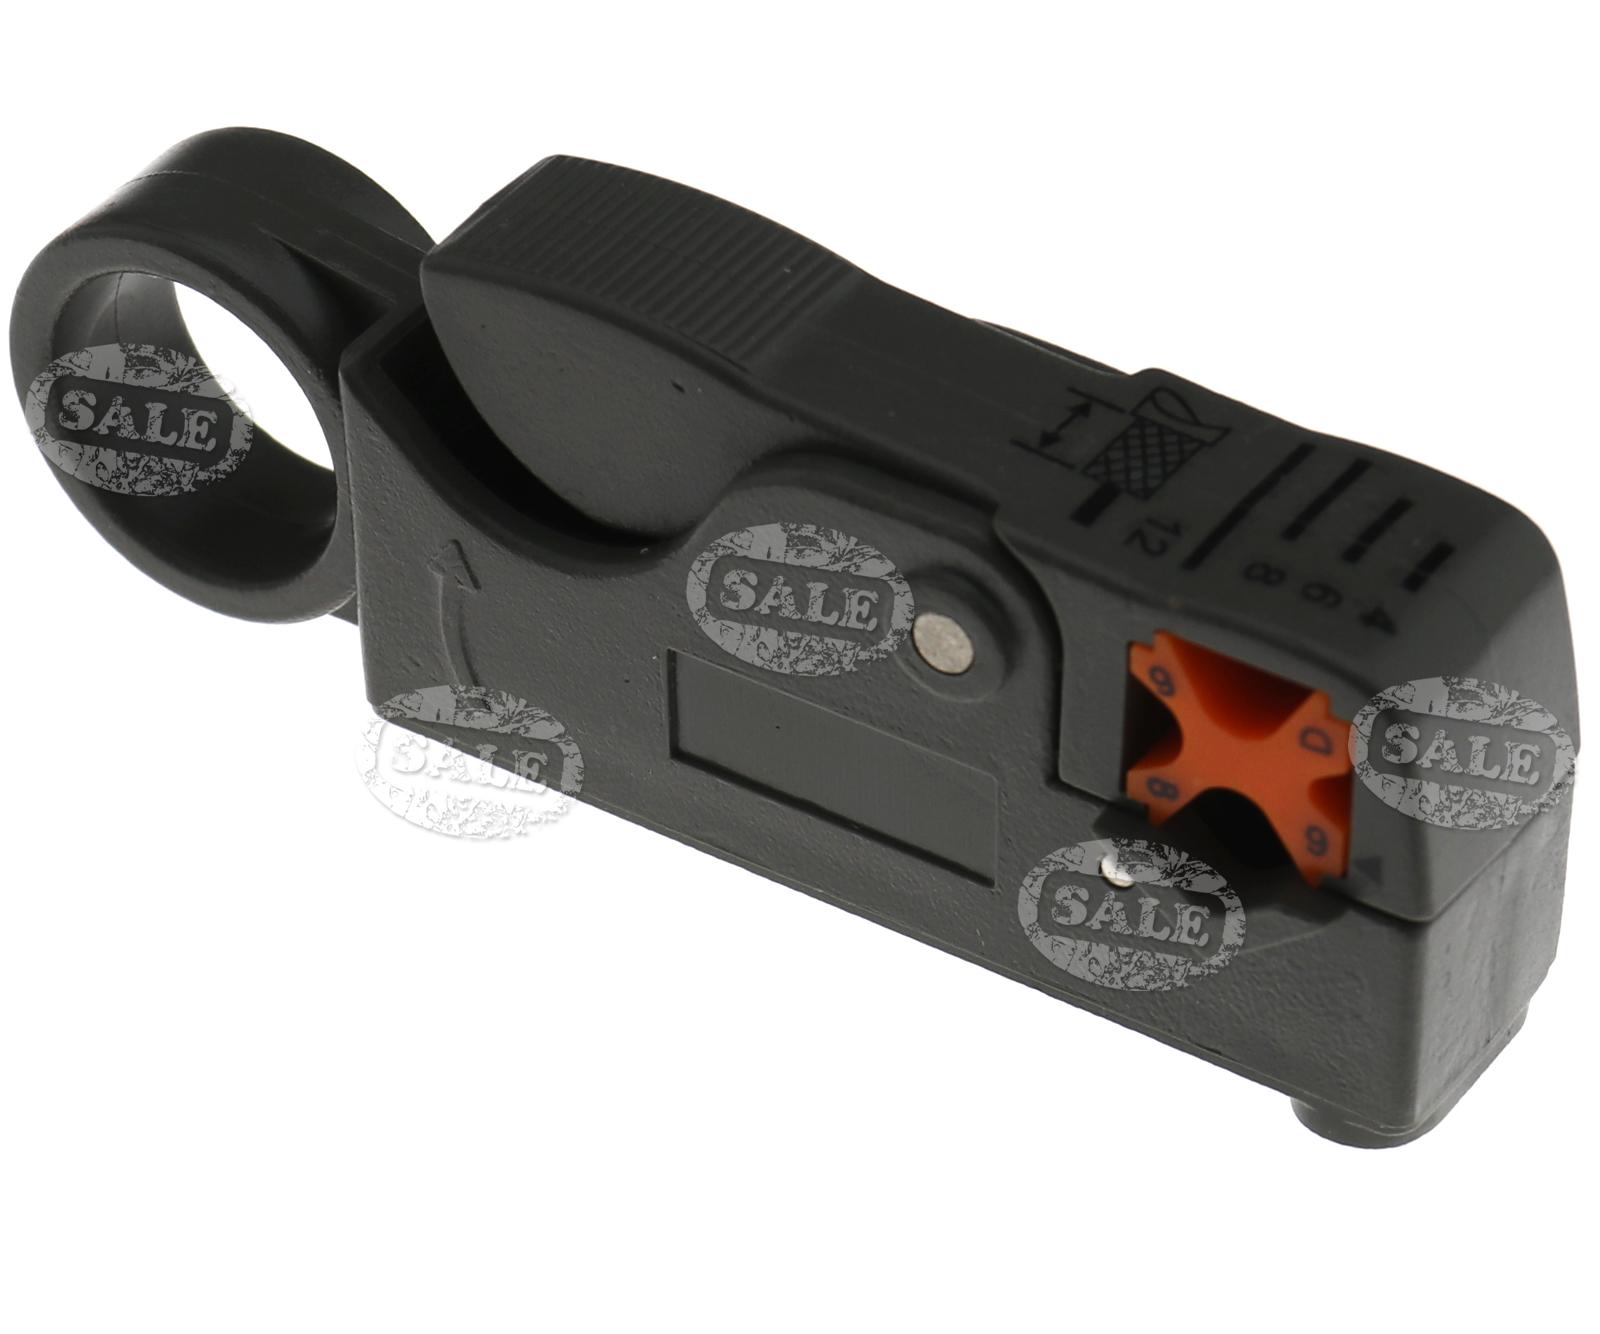 1 x Rotary Coax Coaxial Cable Cutter Tool RG6 RG59 RG58 Stripper ...